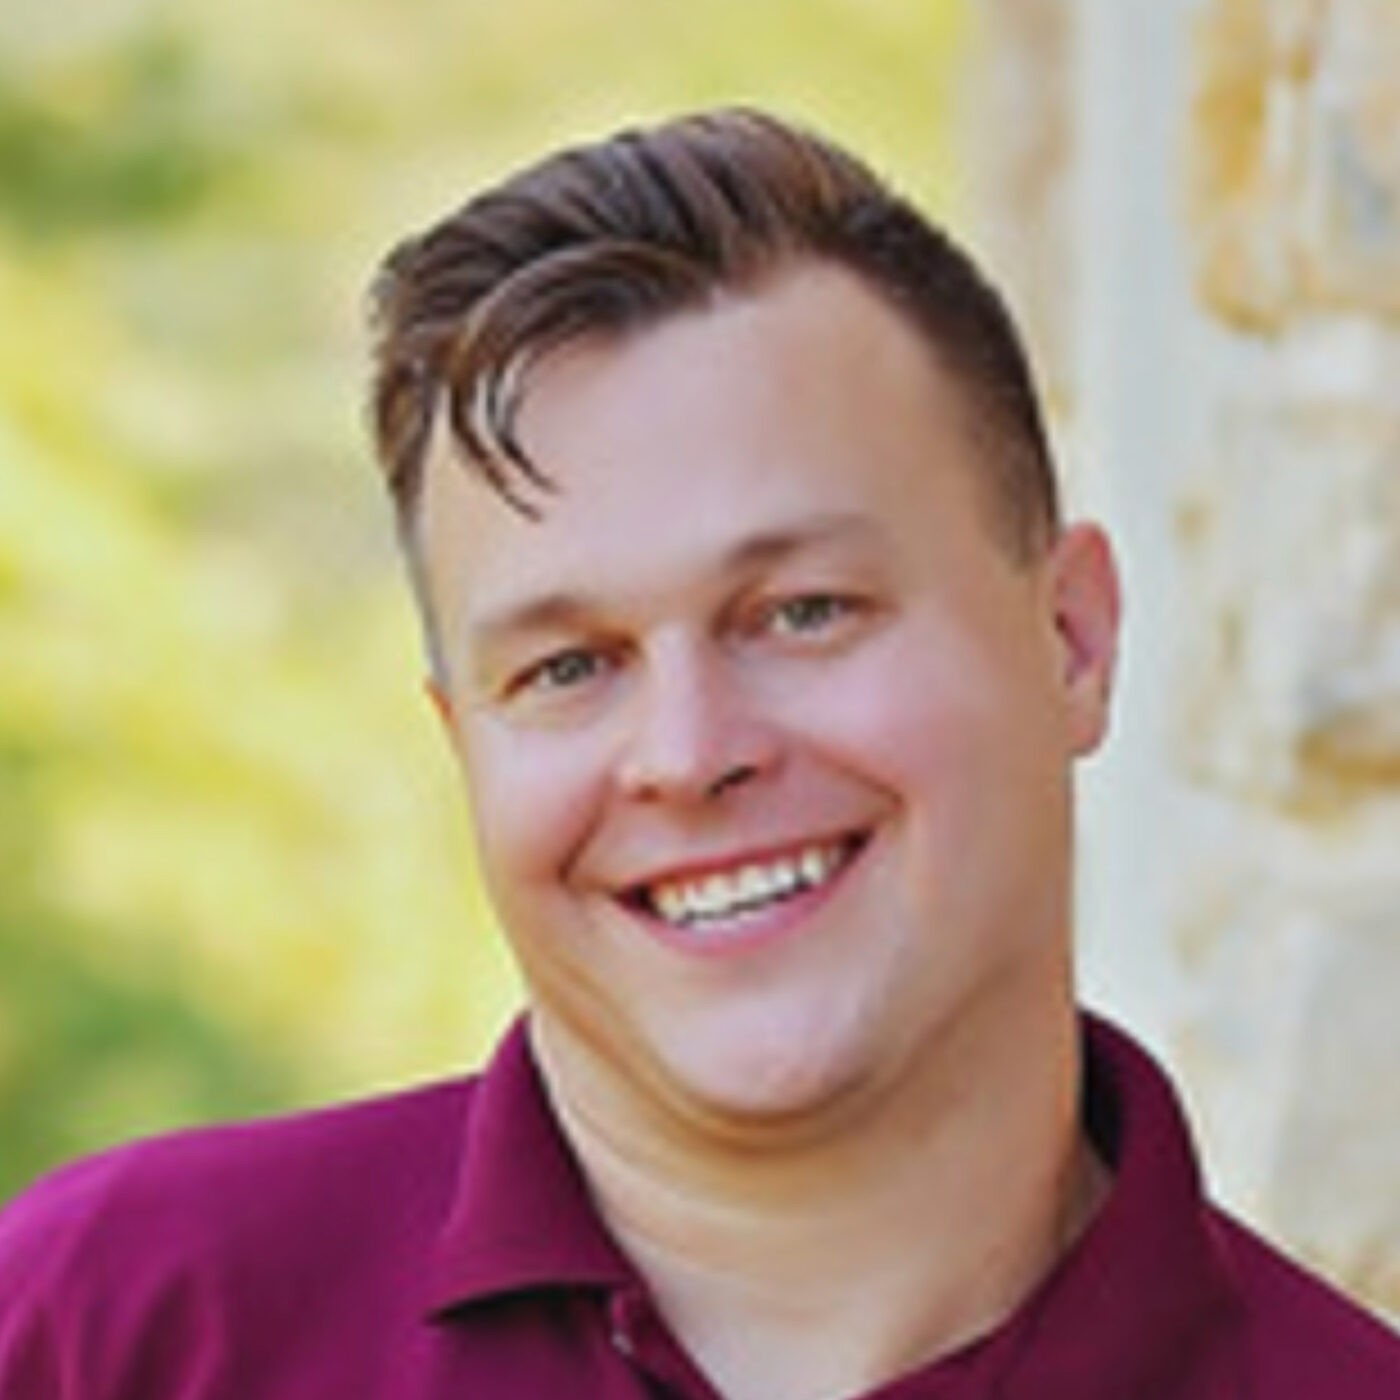 Mercado   Meet the Team - Kevin Dieckhoff - Sales Executive